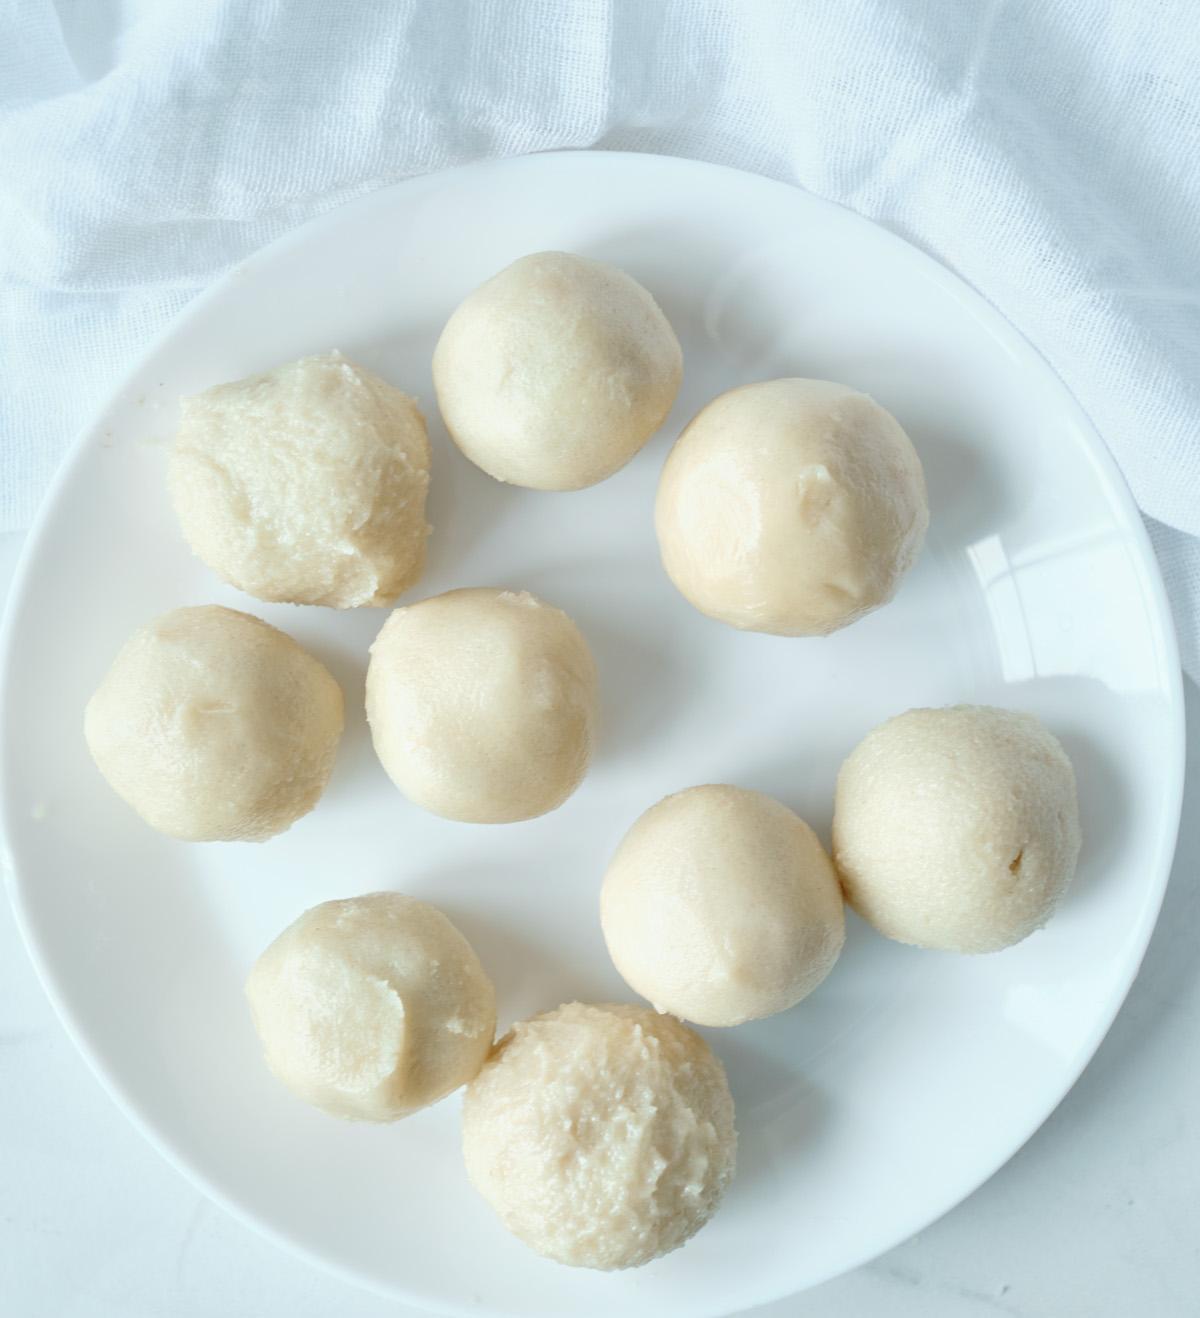 sugar cookie dough balls with caramel eggs inside